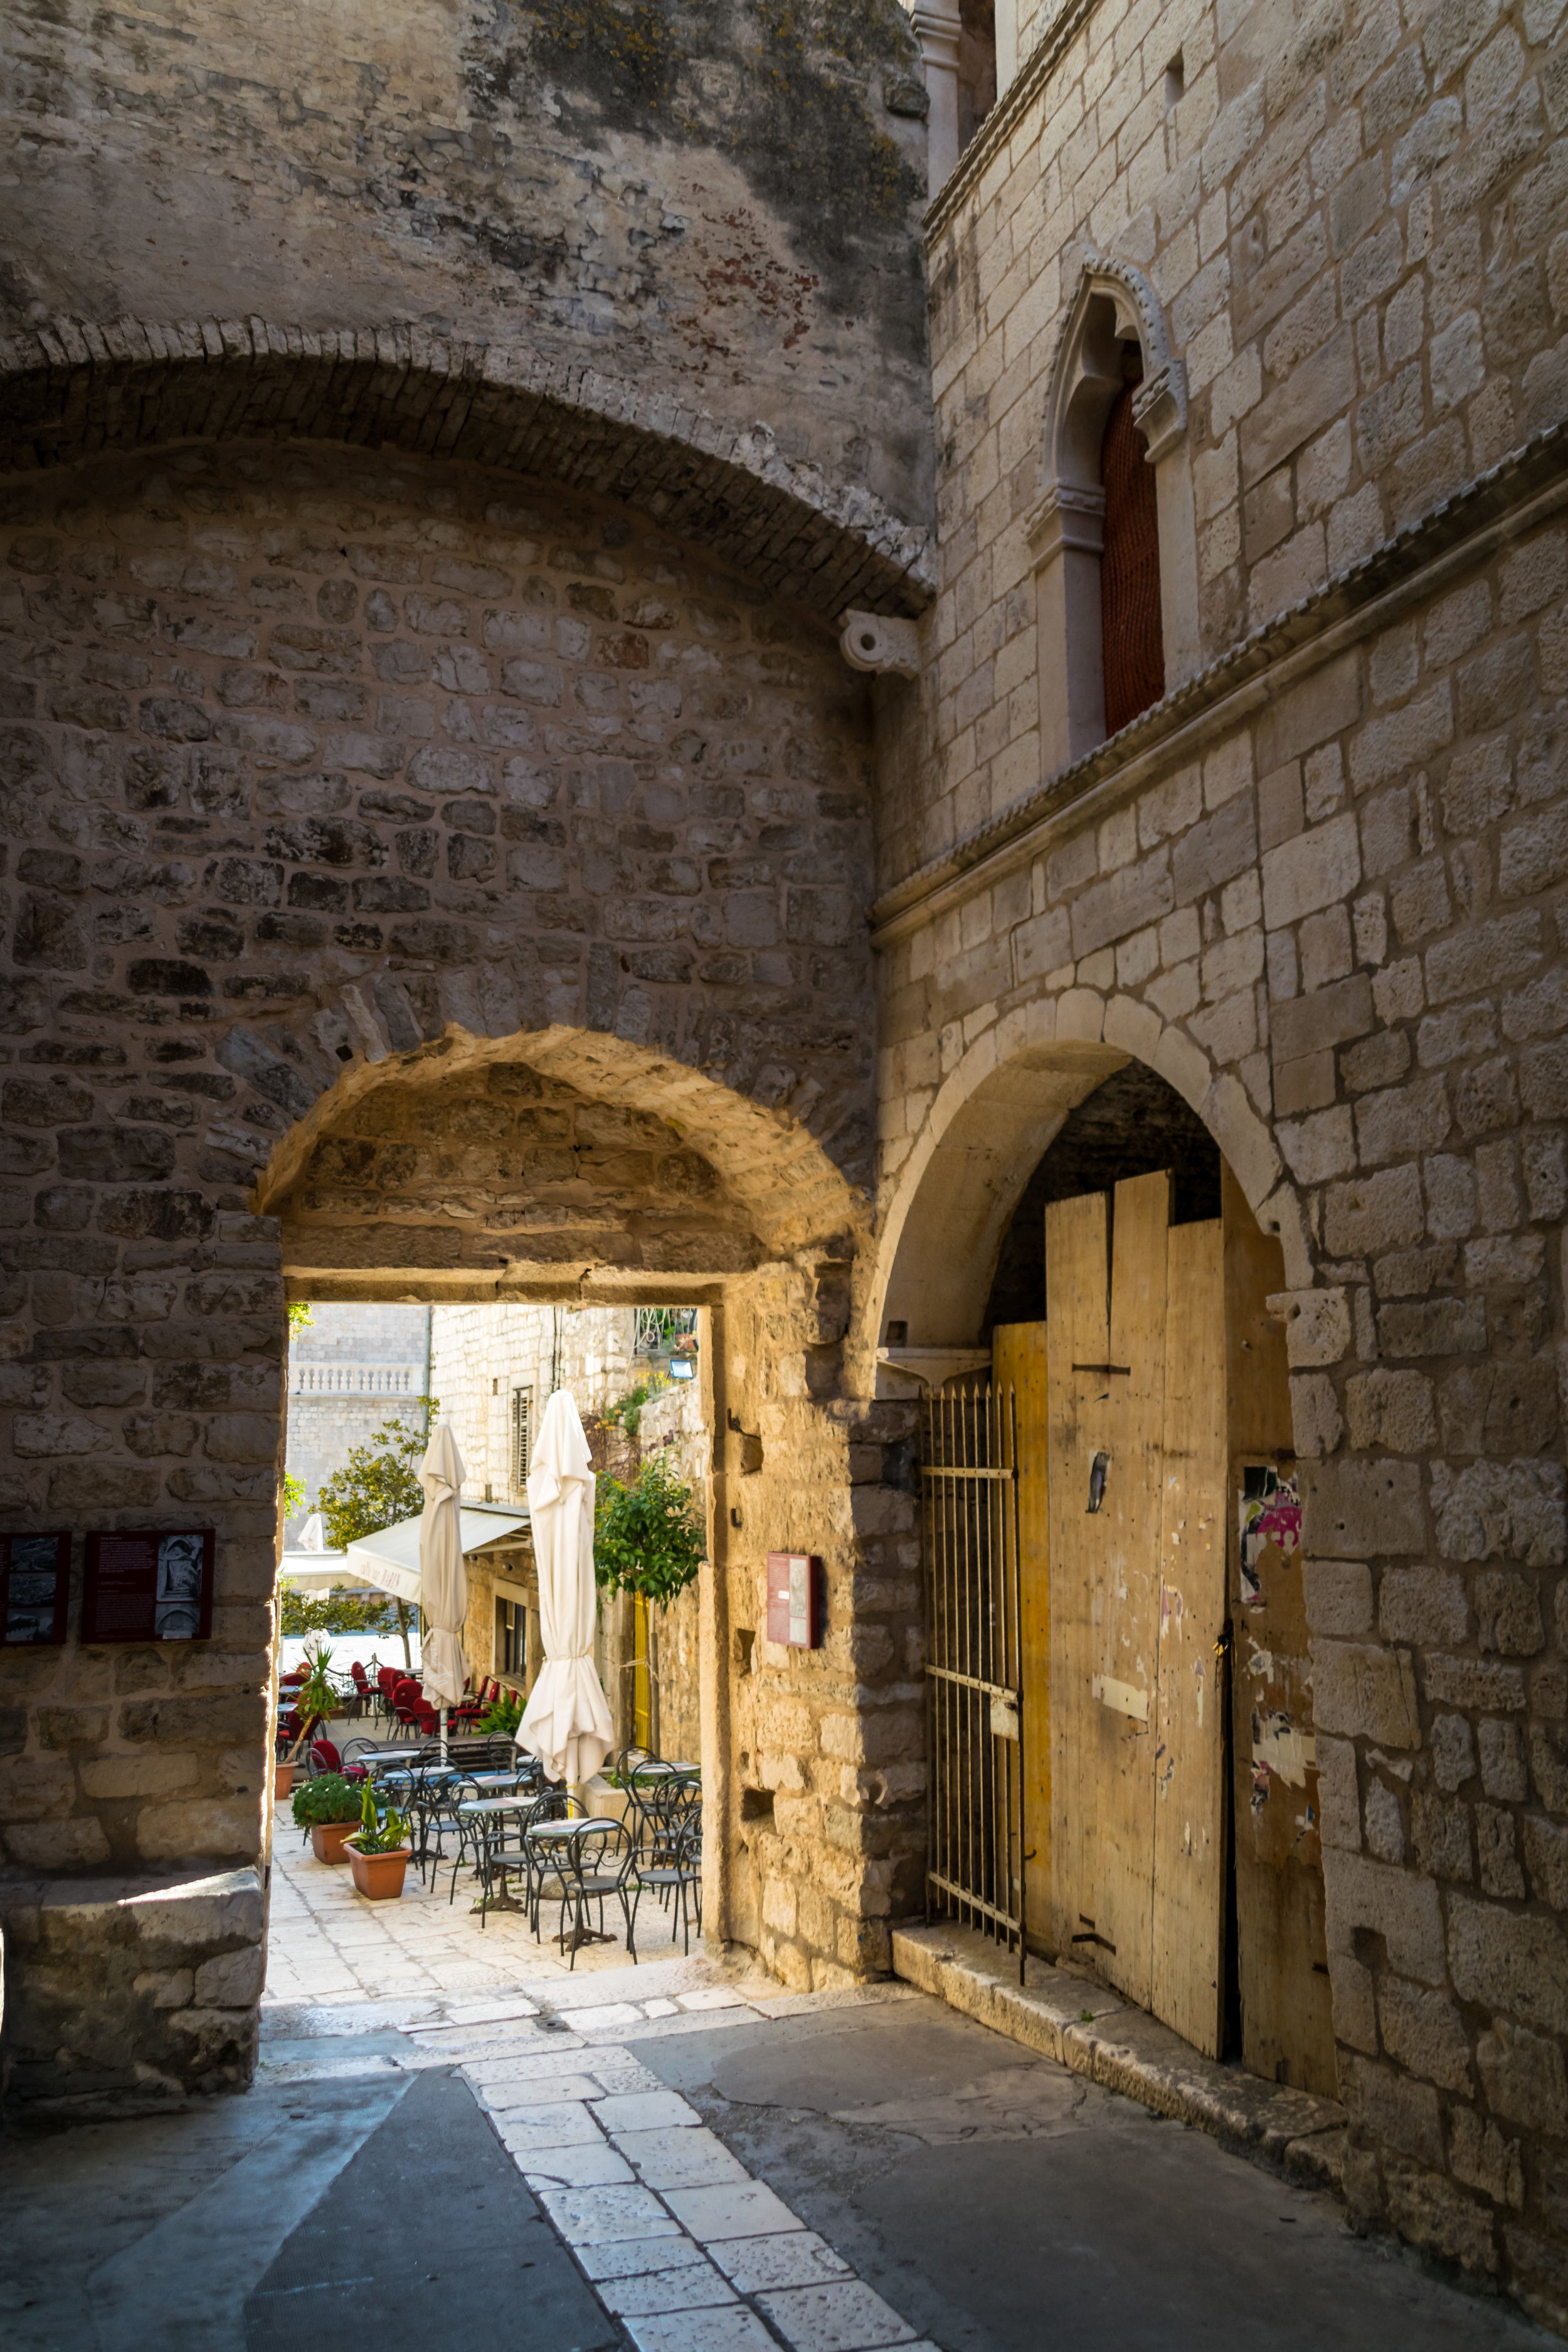 ancient city walls & gate